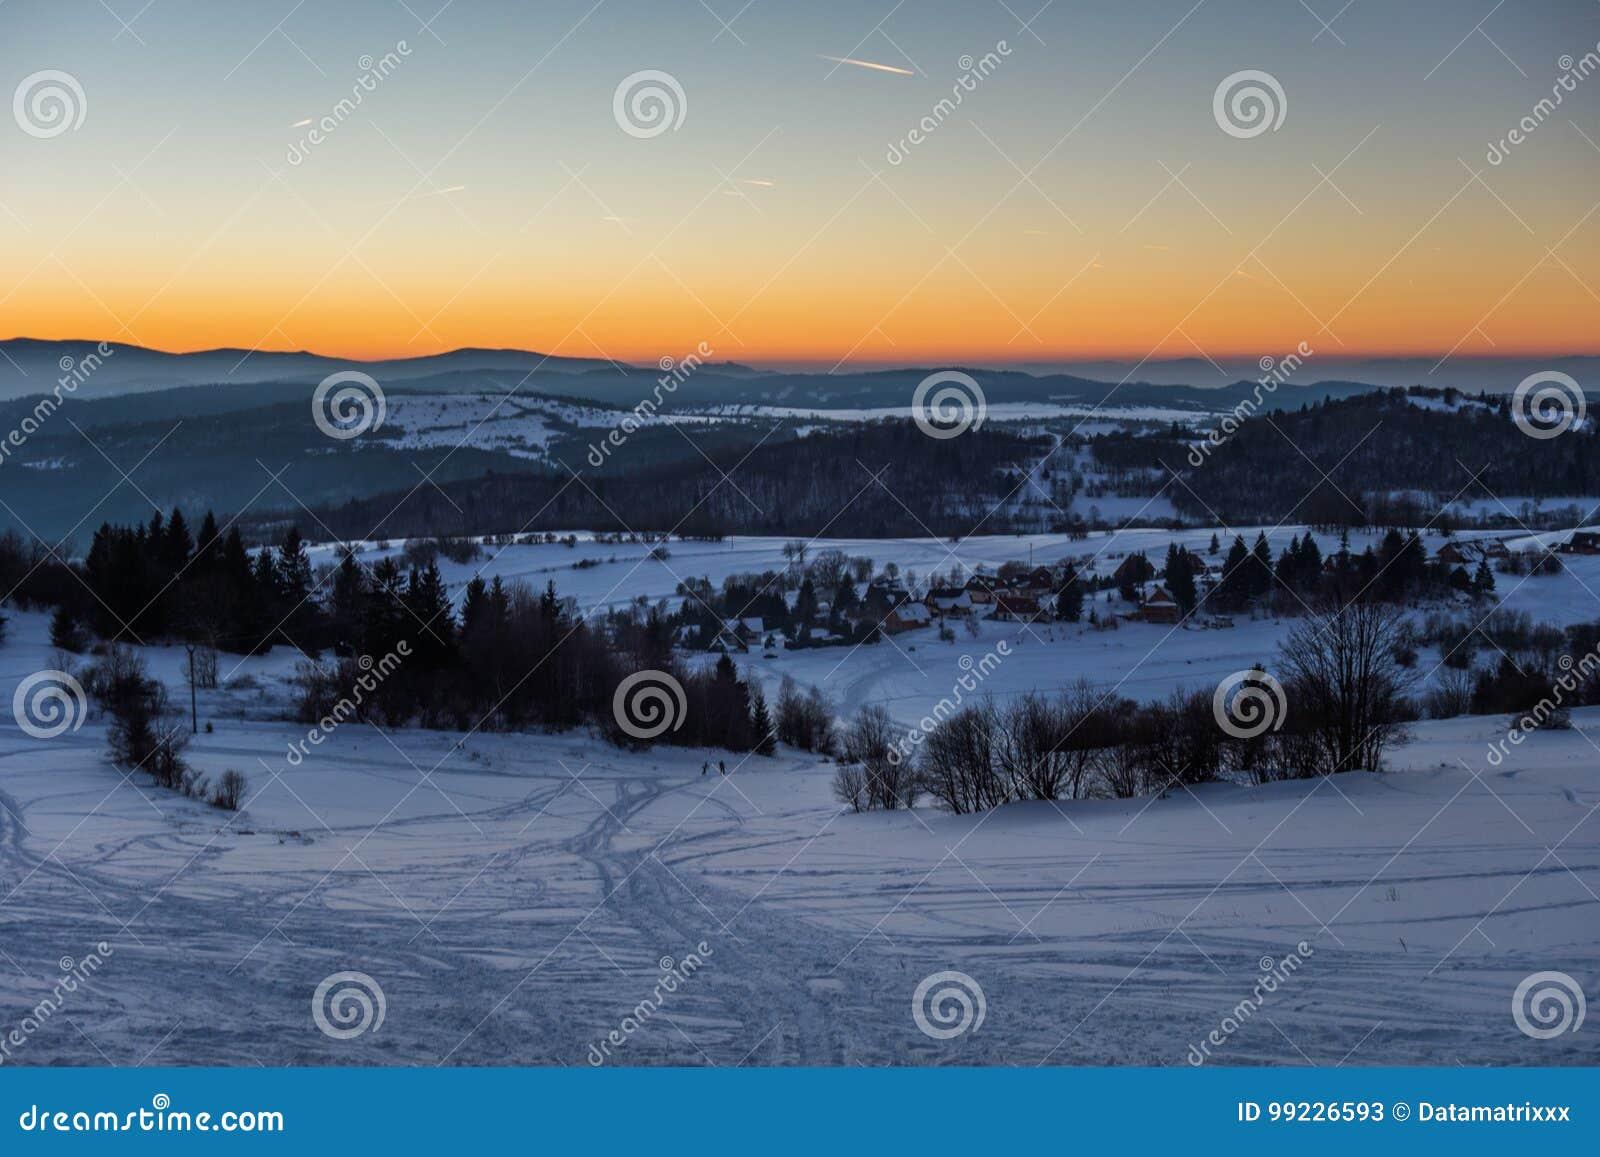 Slovakian landscapes